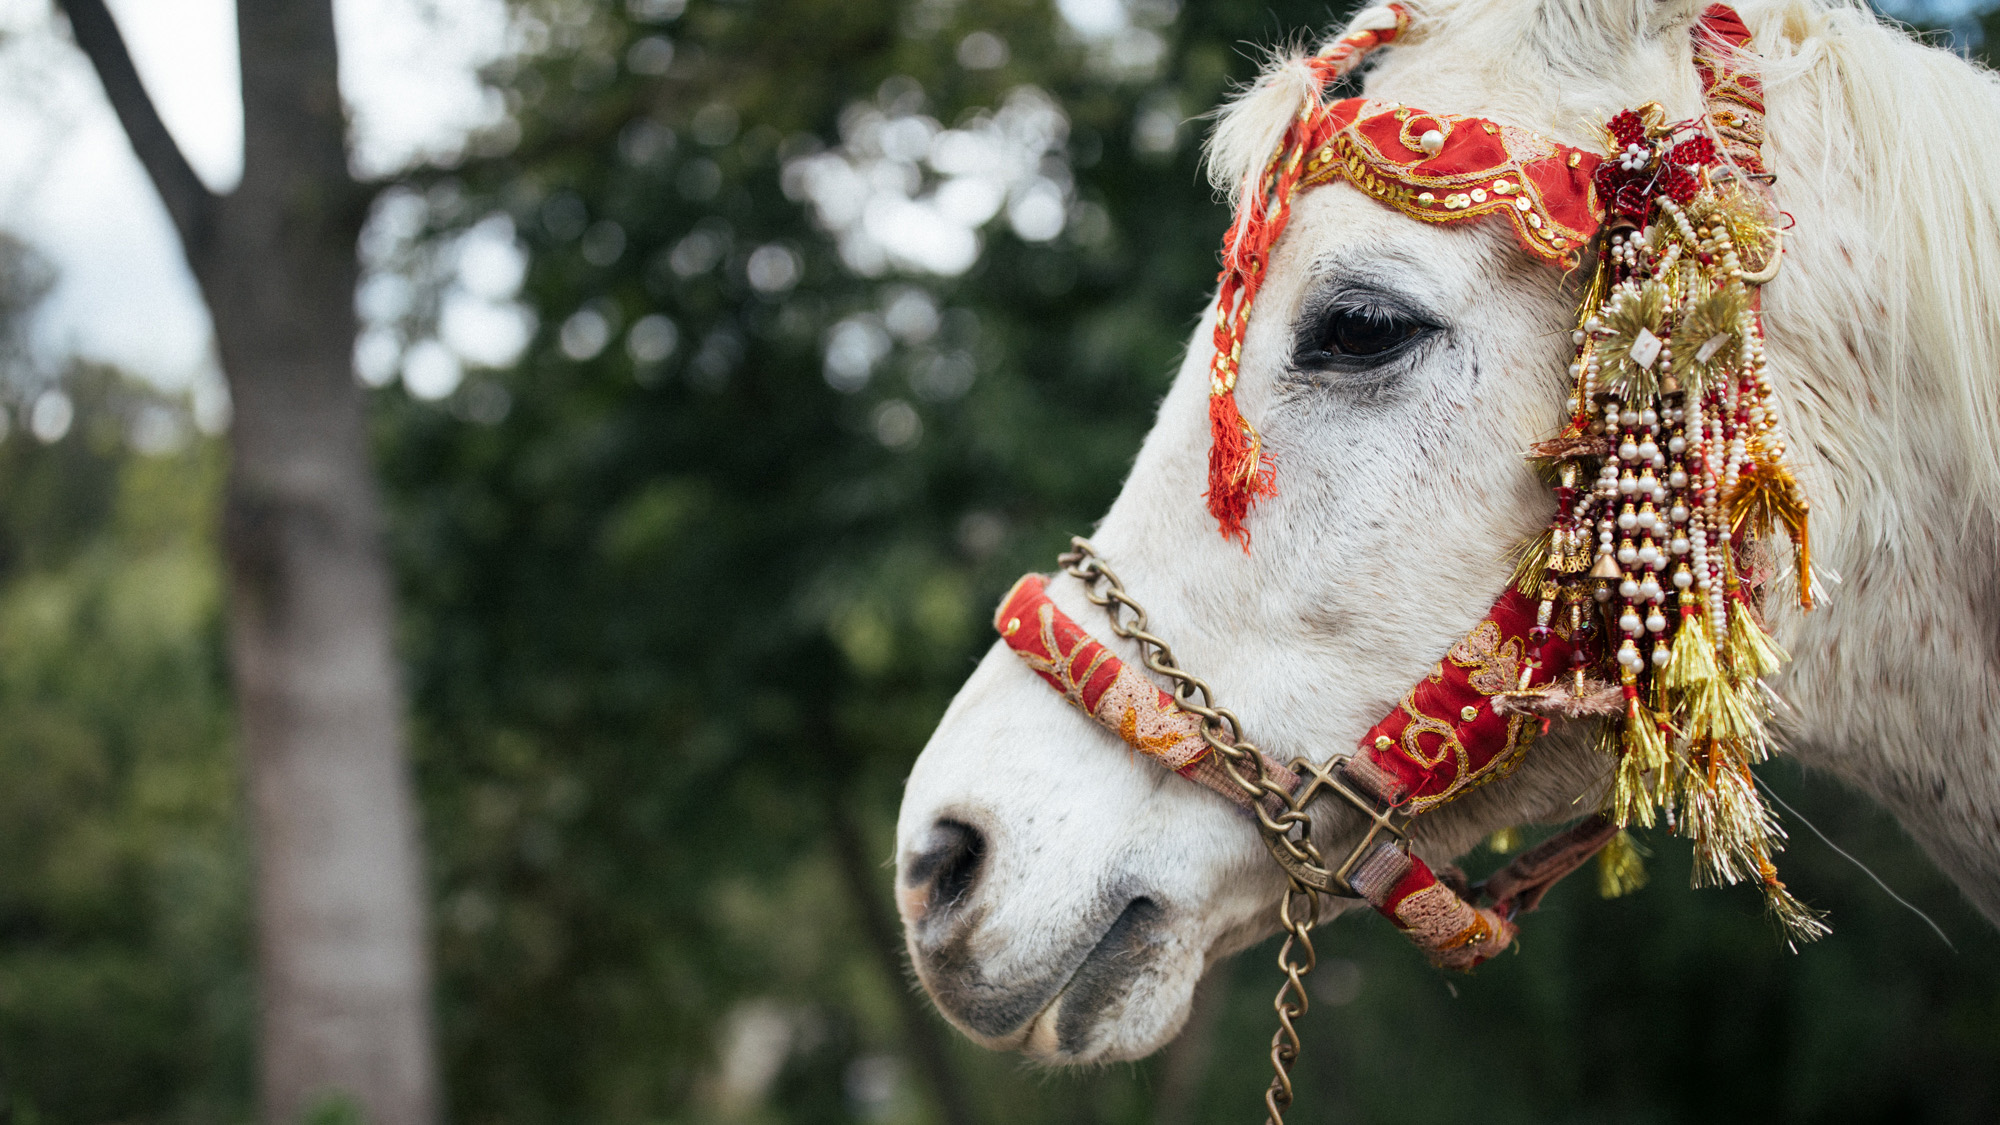 anu_maneesh_alec_vanderboom_Indian_wedding_photography-0067.jpg